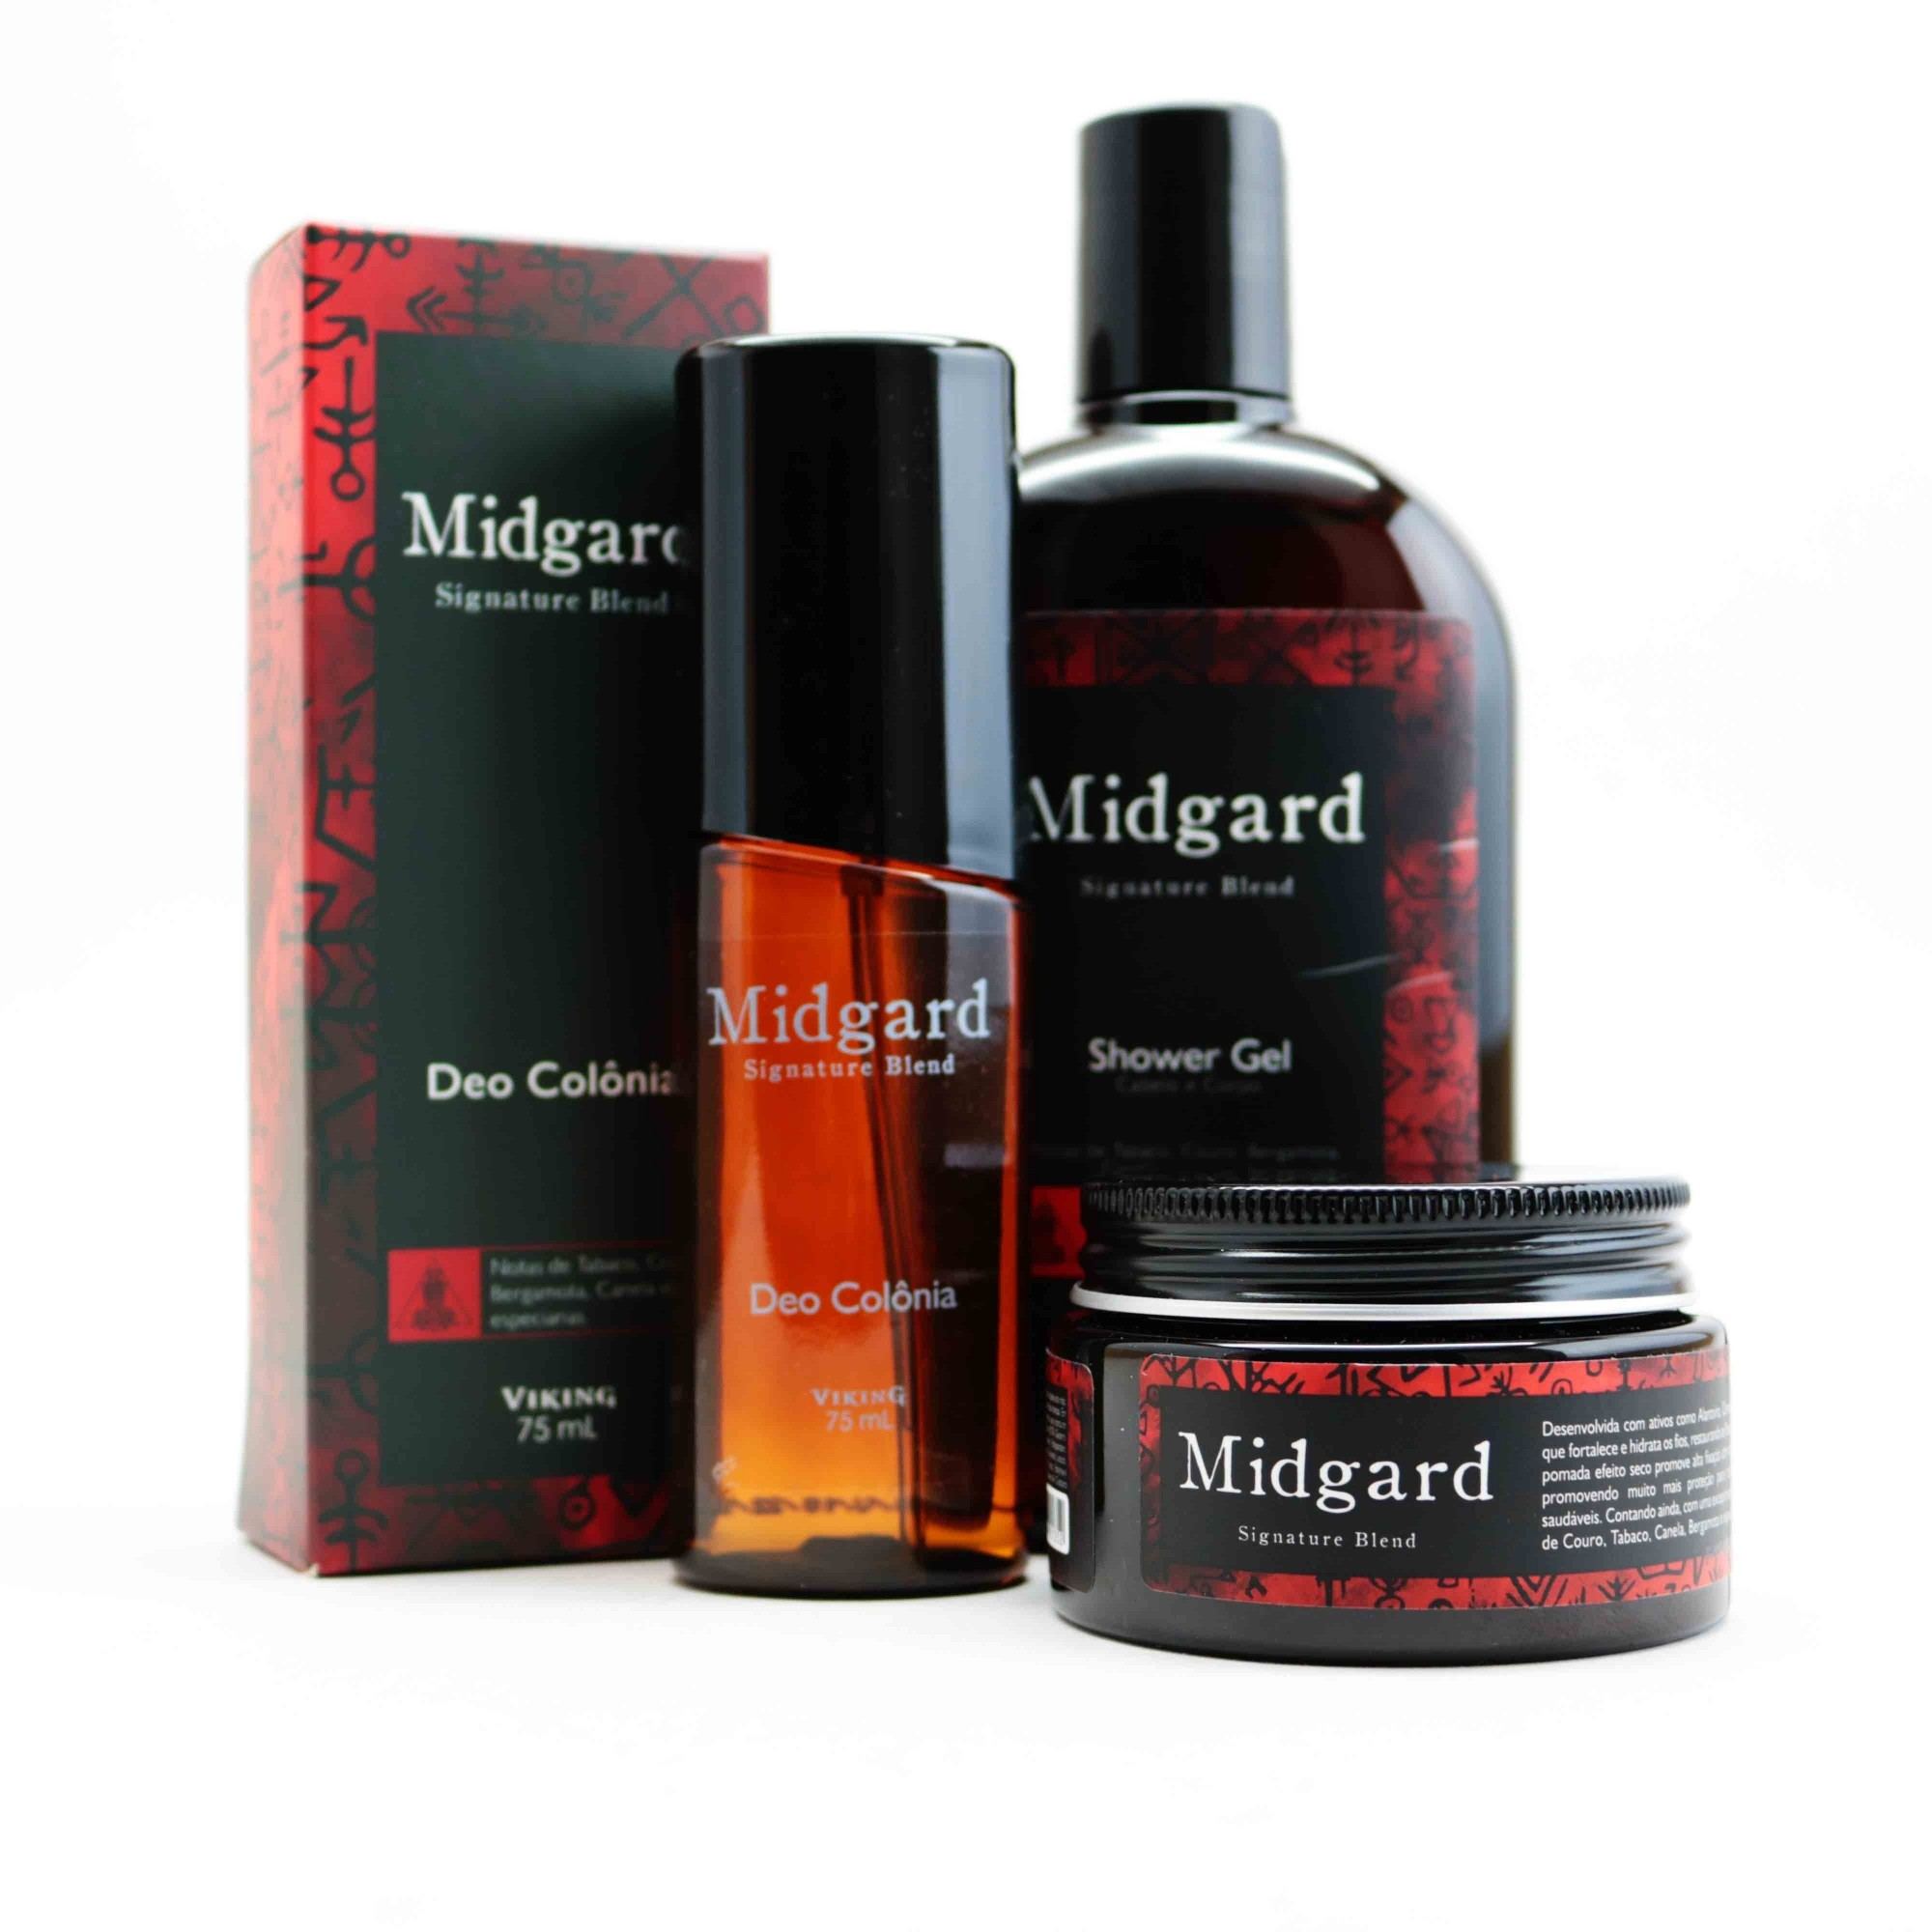 Kit Diário Midgard - Viking (NOVO)  - Viking